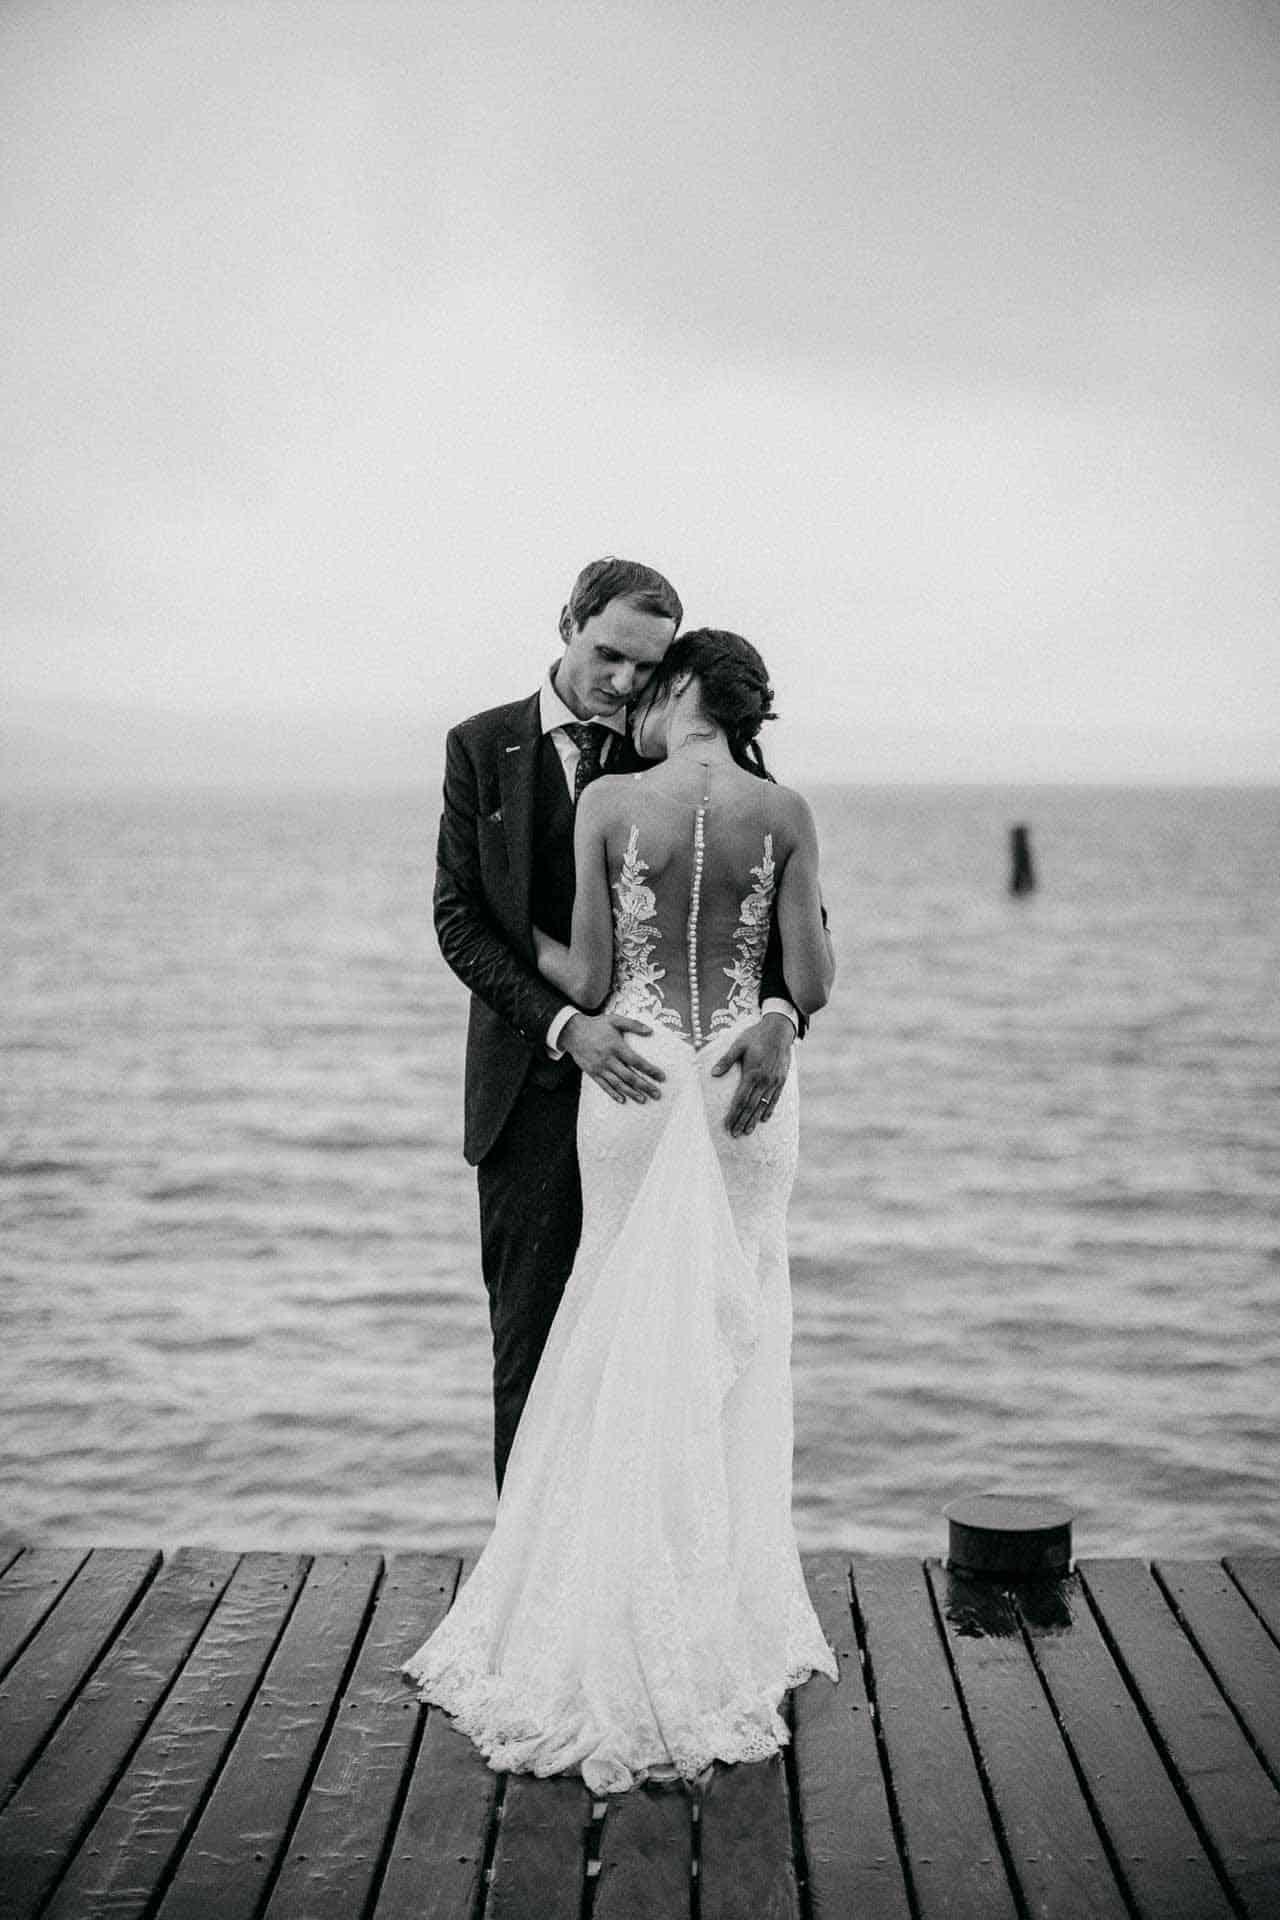 Slesvig bryllup - Vores store dag fotografi